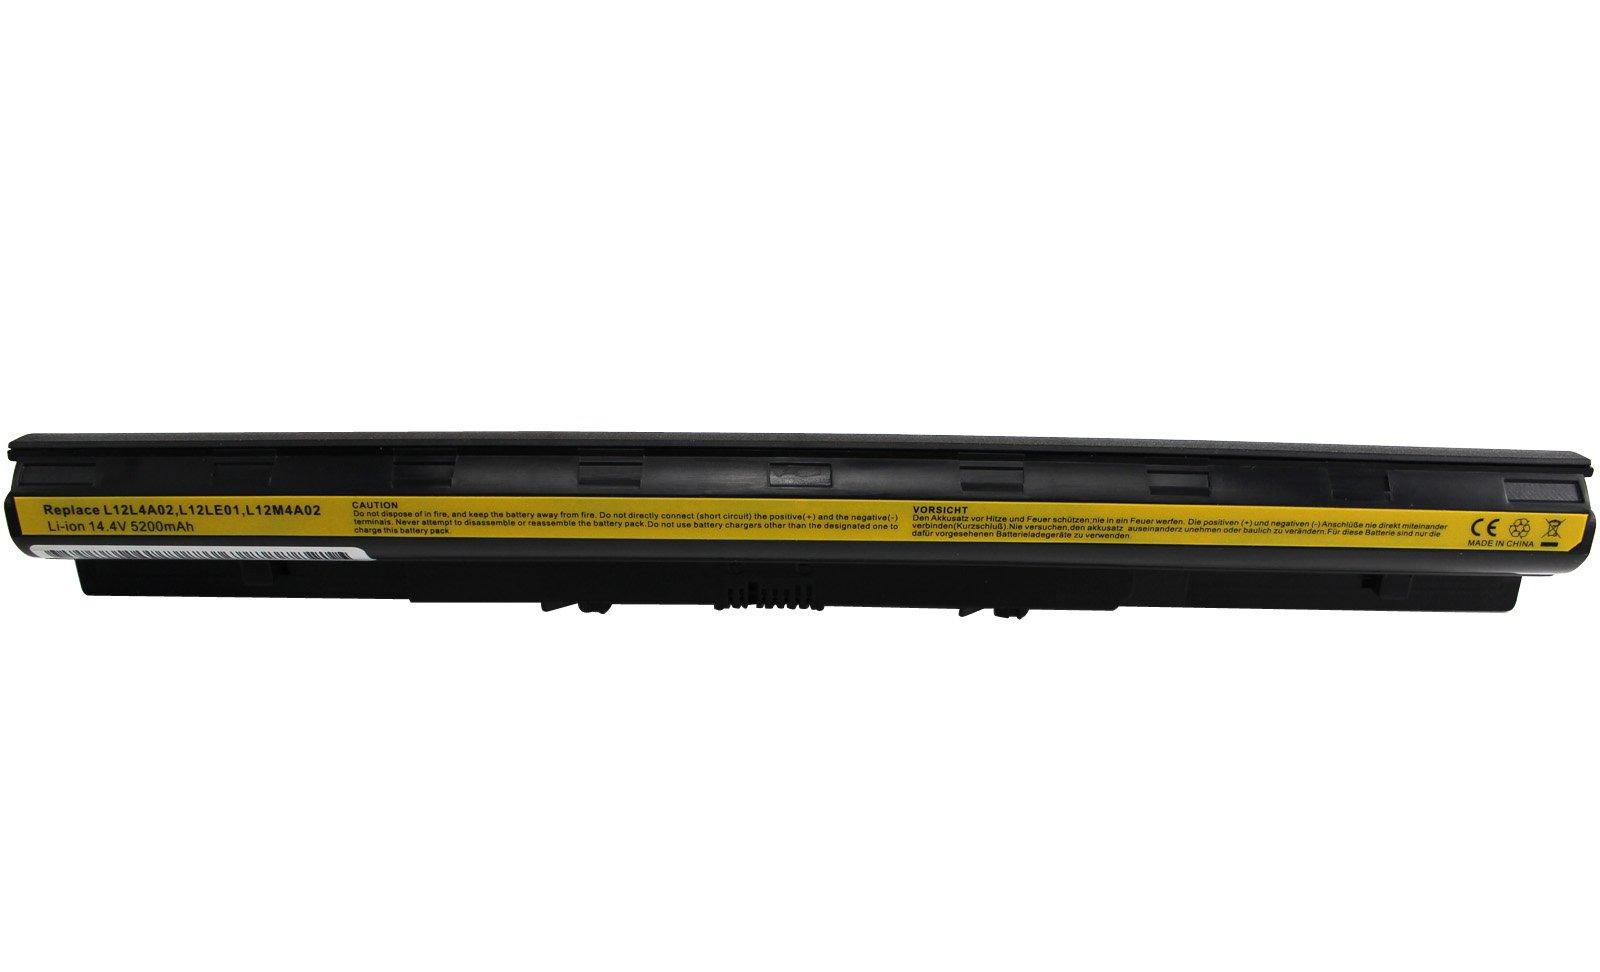 Bateria 8 Celdas G400S para Lenovo Ideapad G40-30 G40-70 G50-70 G50-80 Z40-75 Z70-80 L12L4A02 L12L4E01 L12M4A02 L12M4E01